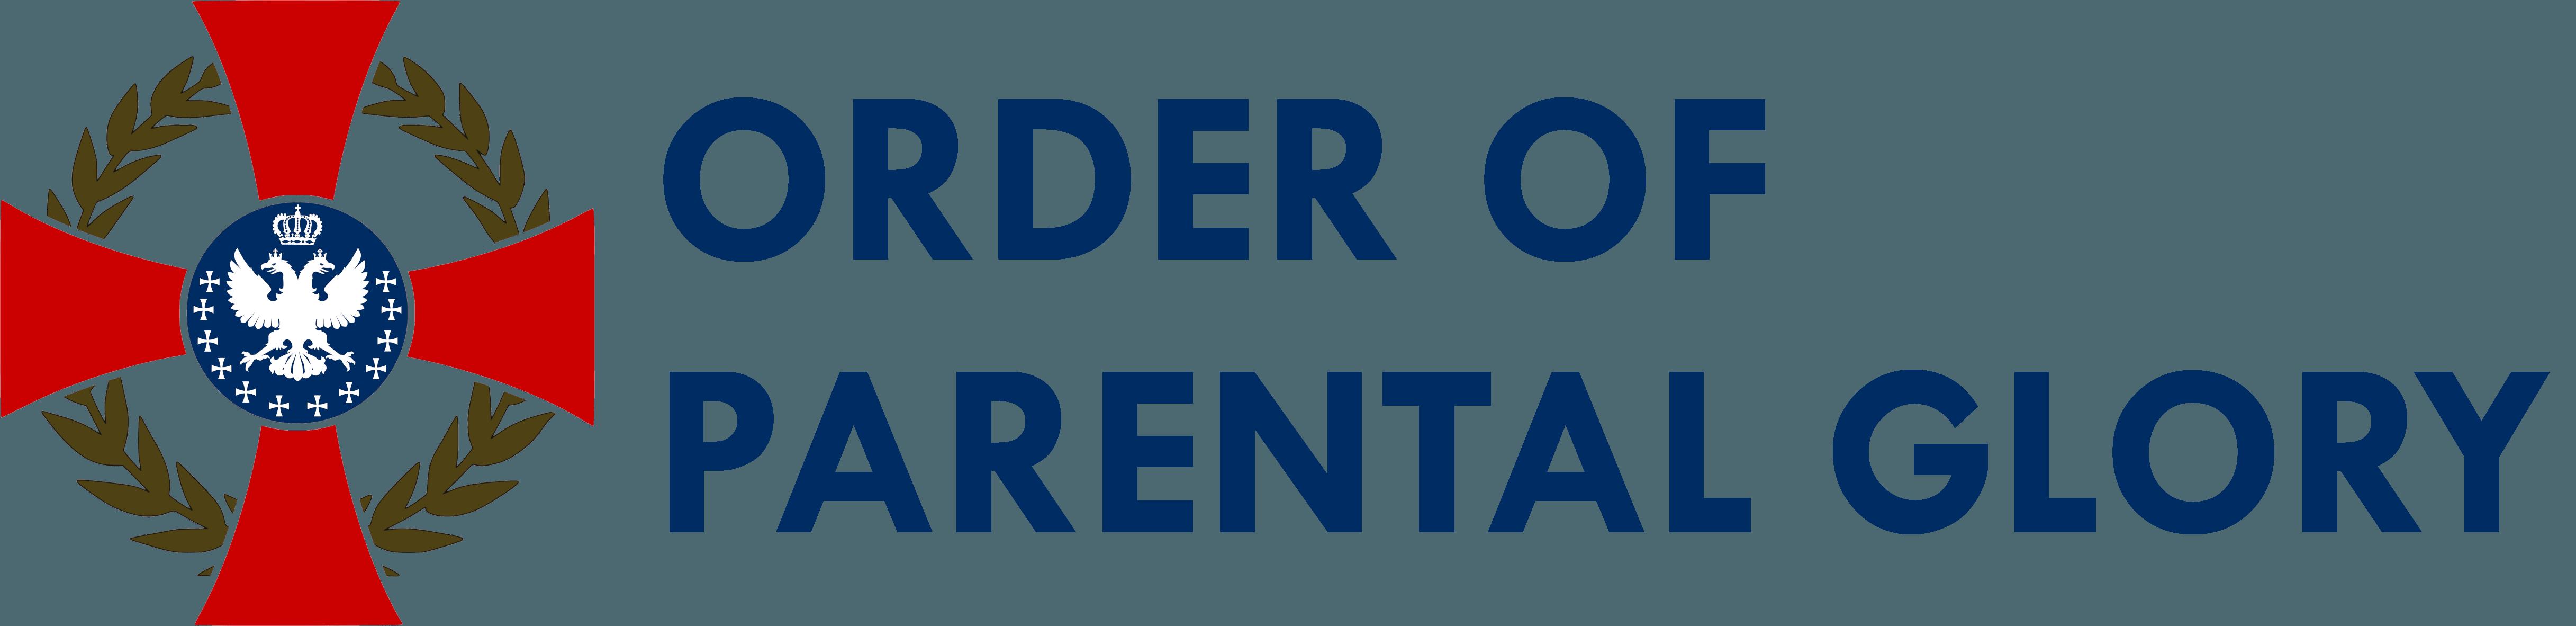 Order Of Parental Glory